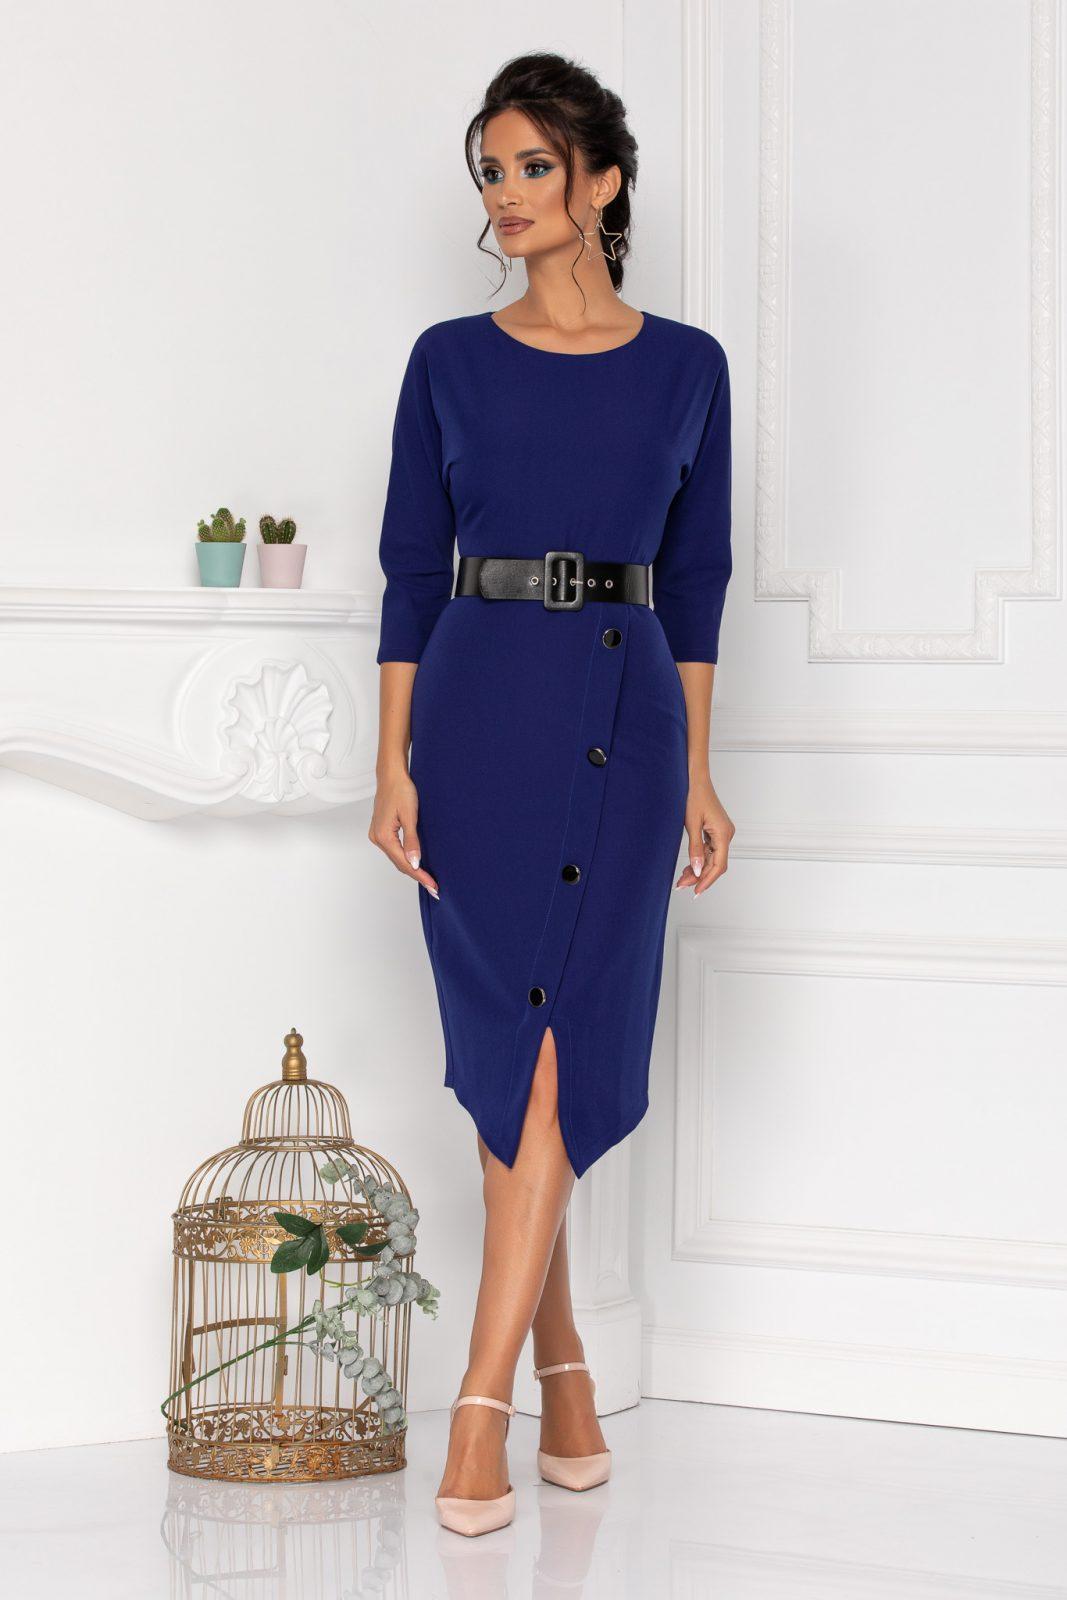 Audrey Royal Blue Dress